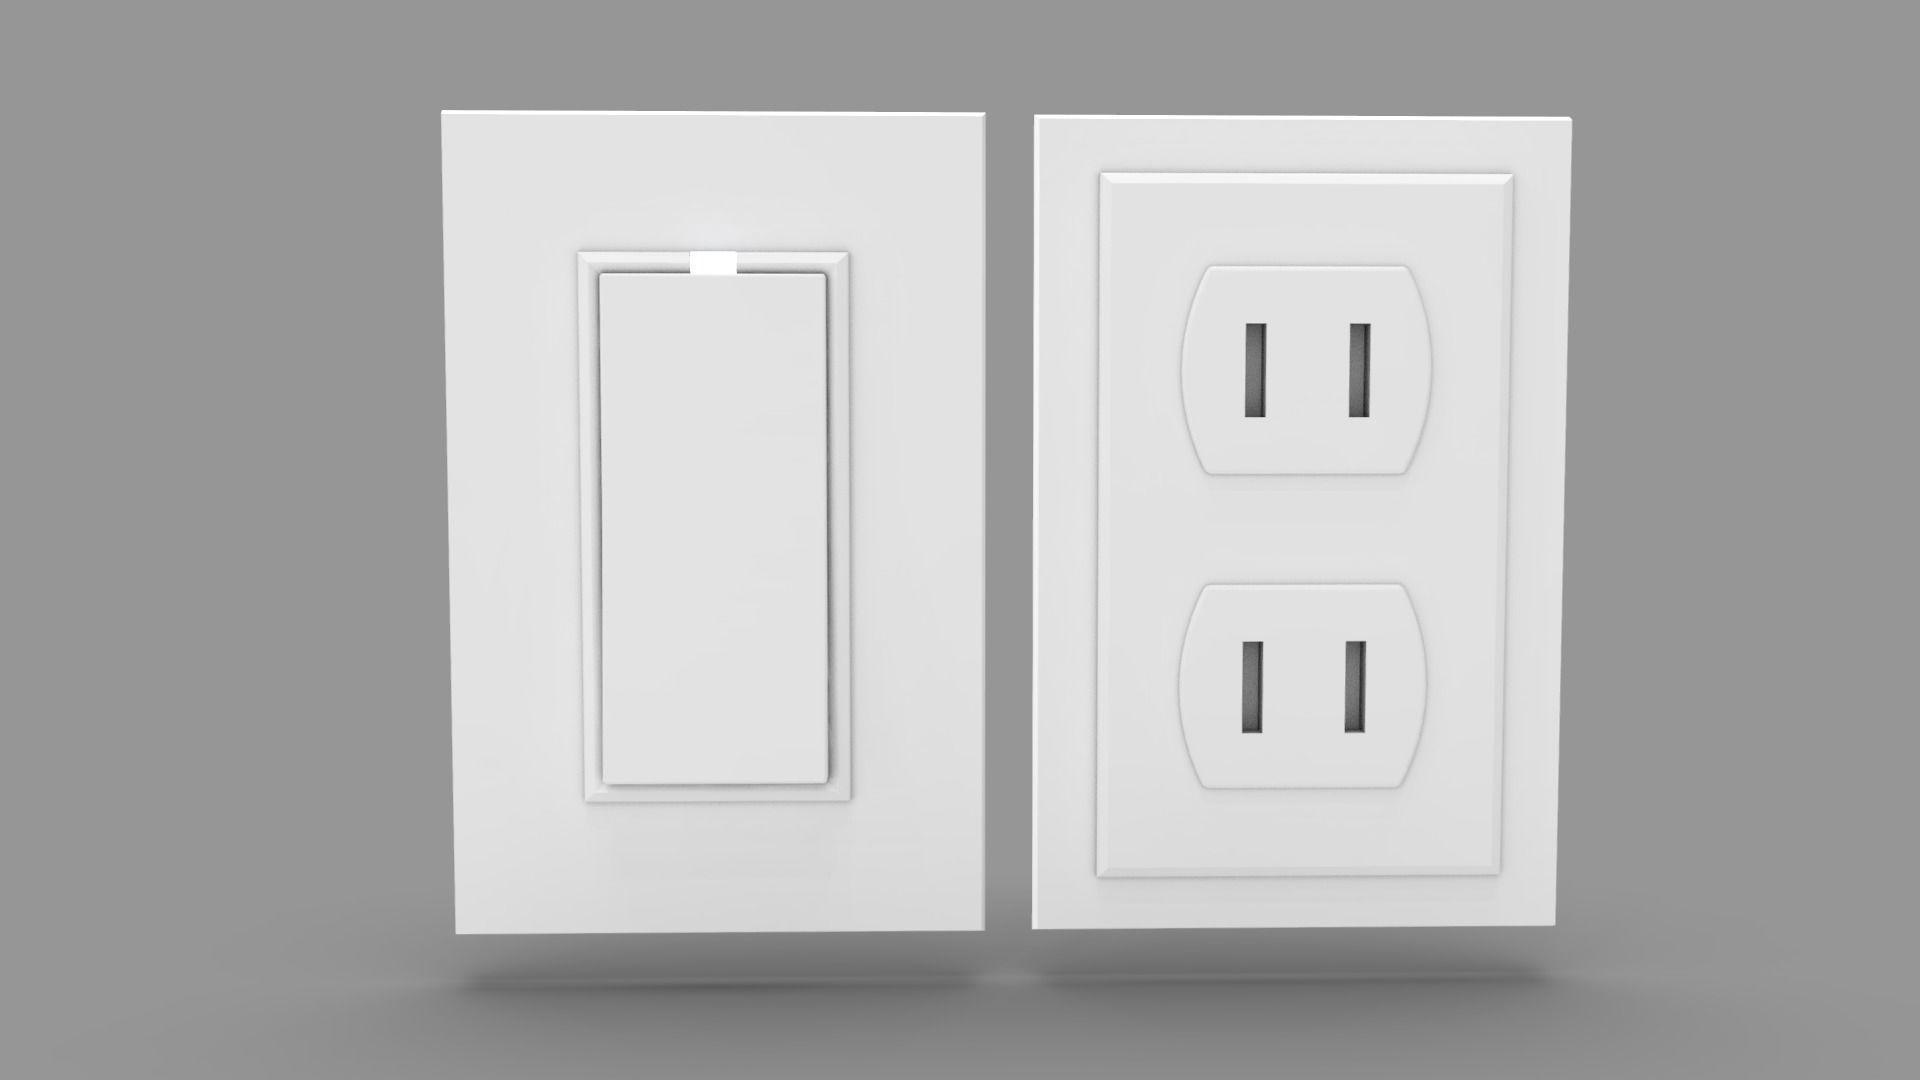 Wall Switch and Plug Socket